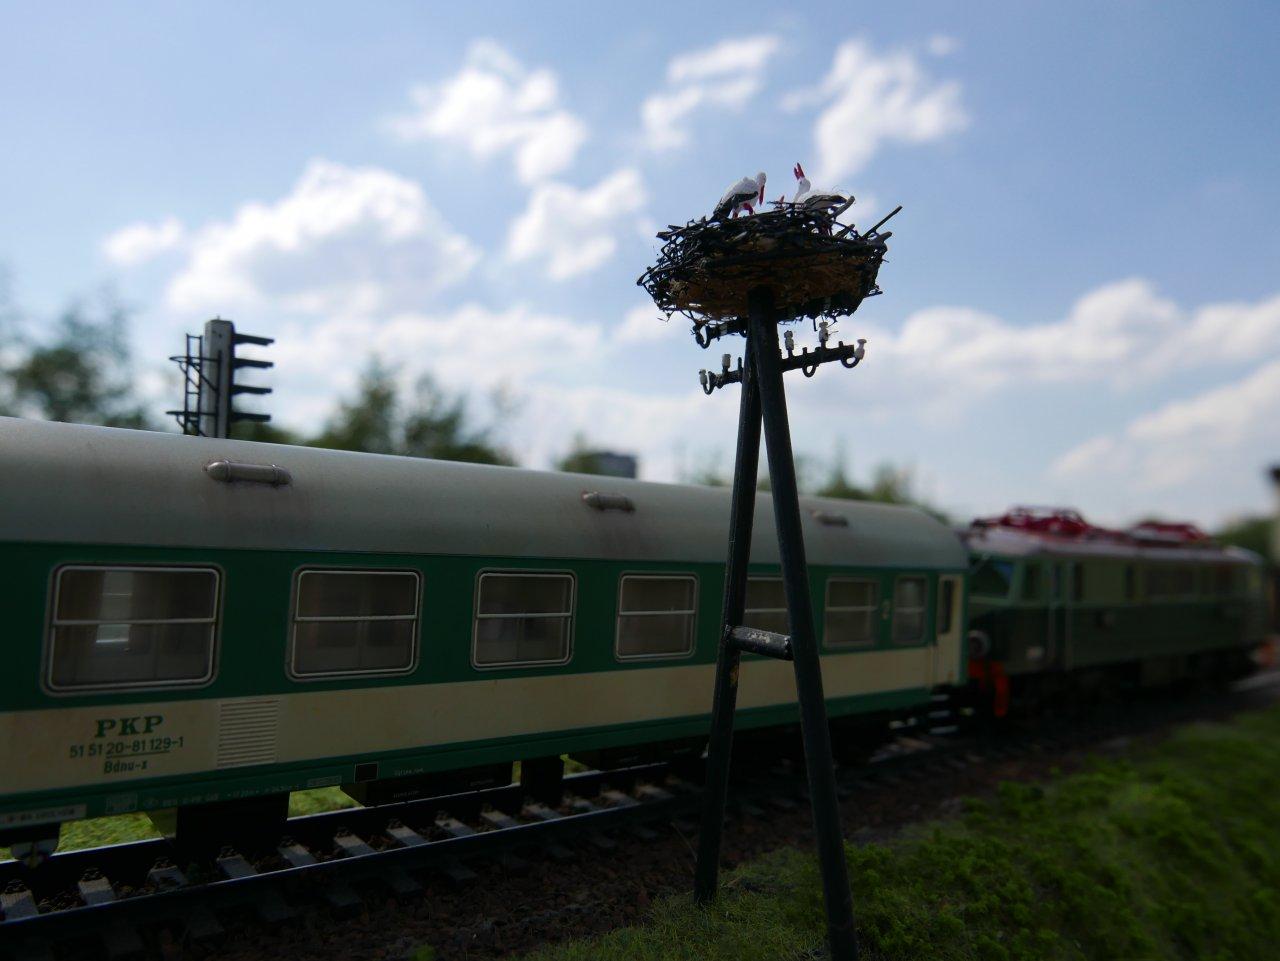 P1000156.JPG